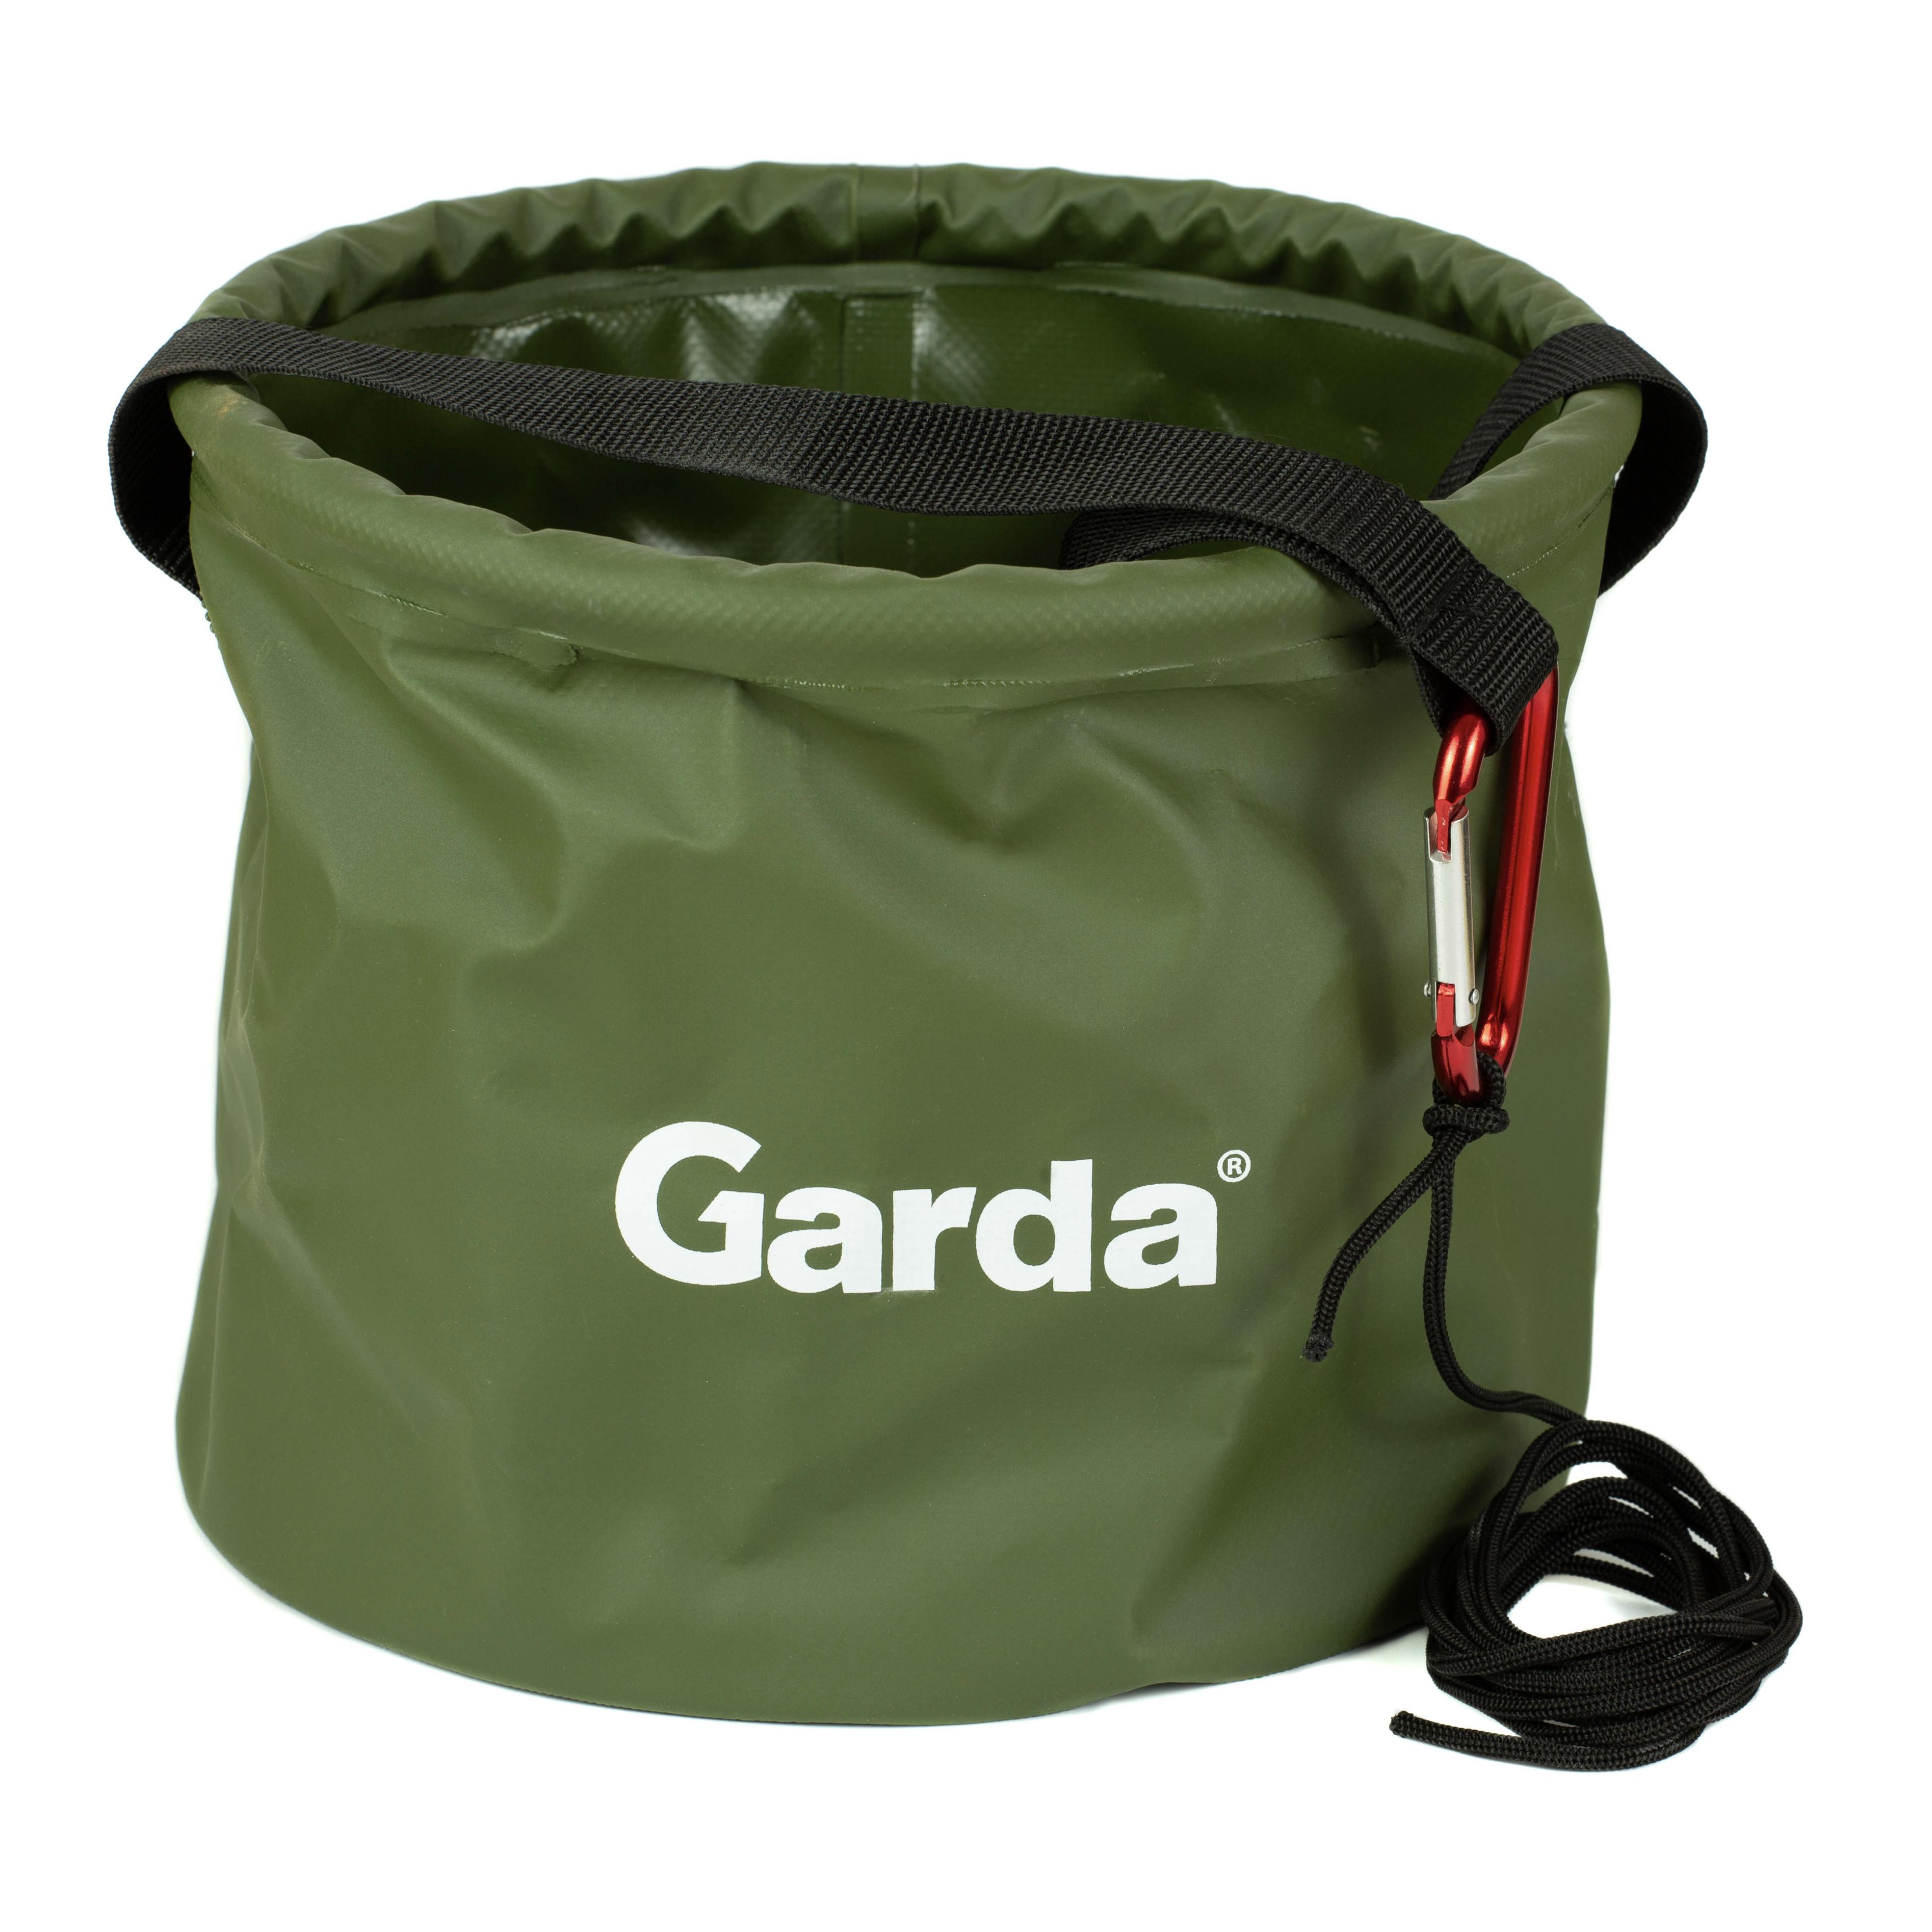 Garda- Nádoba na vodu Compact Water Bucket 10l